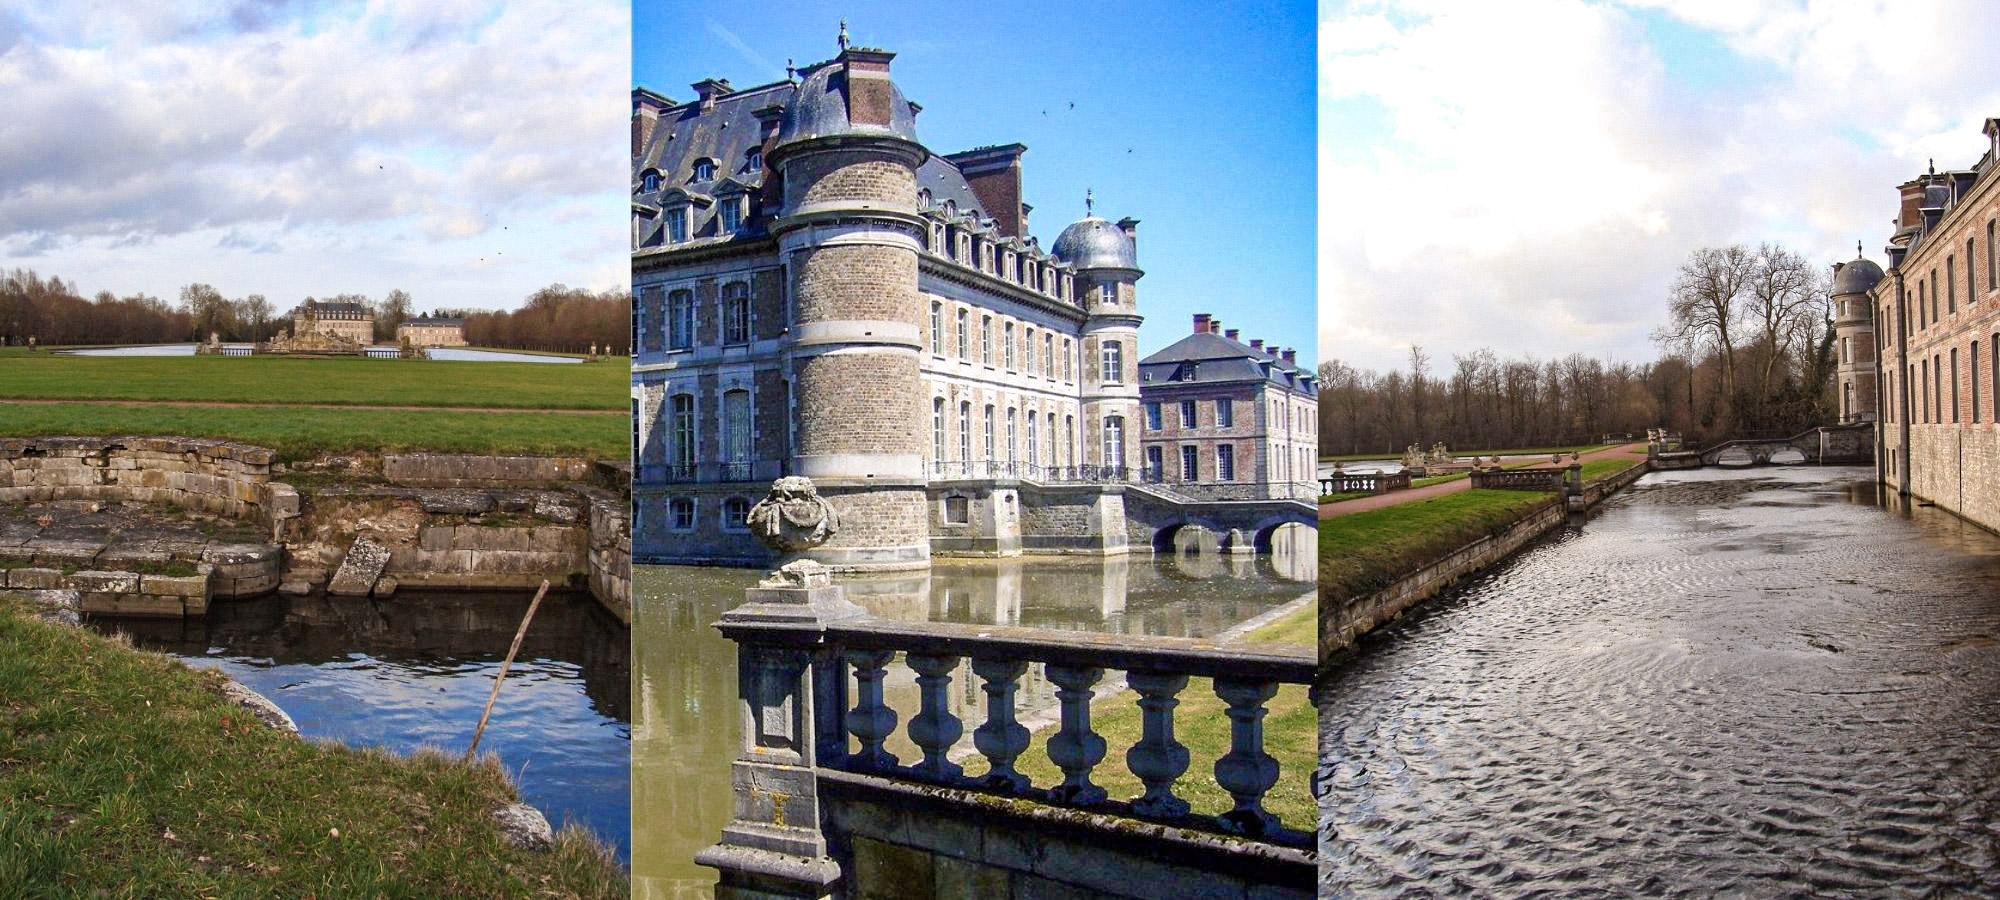 Moated castle, Beloeil Castle, Belgium